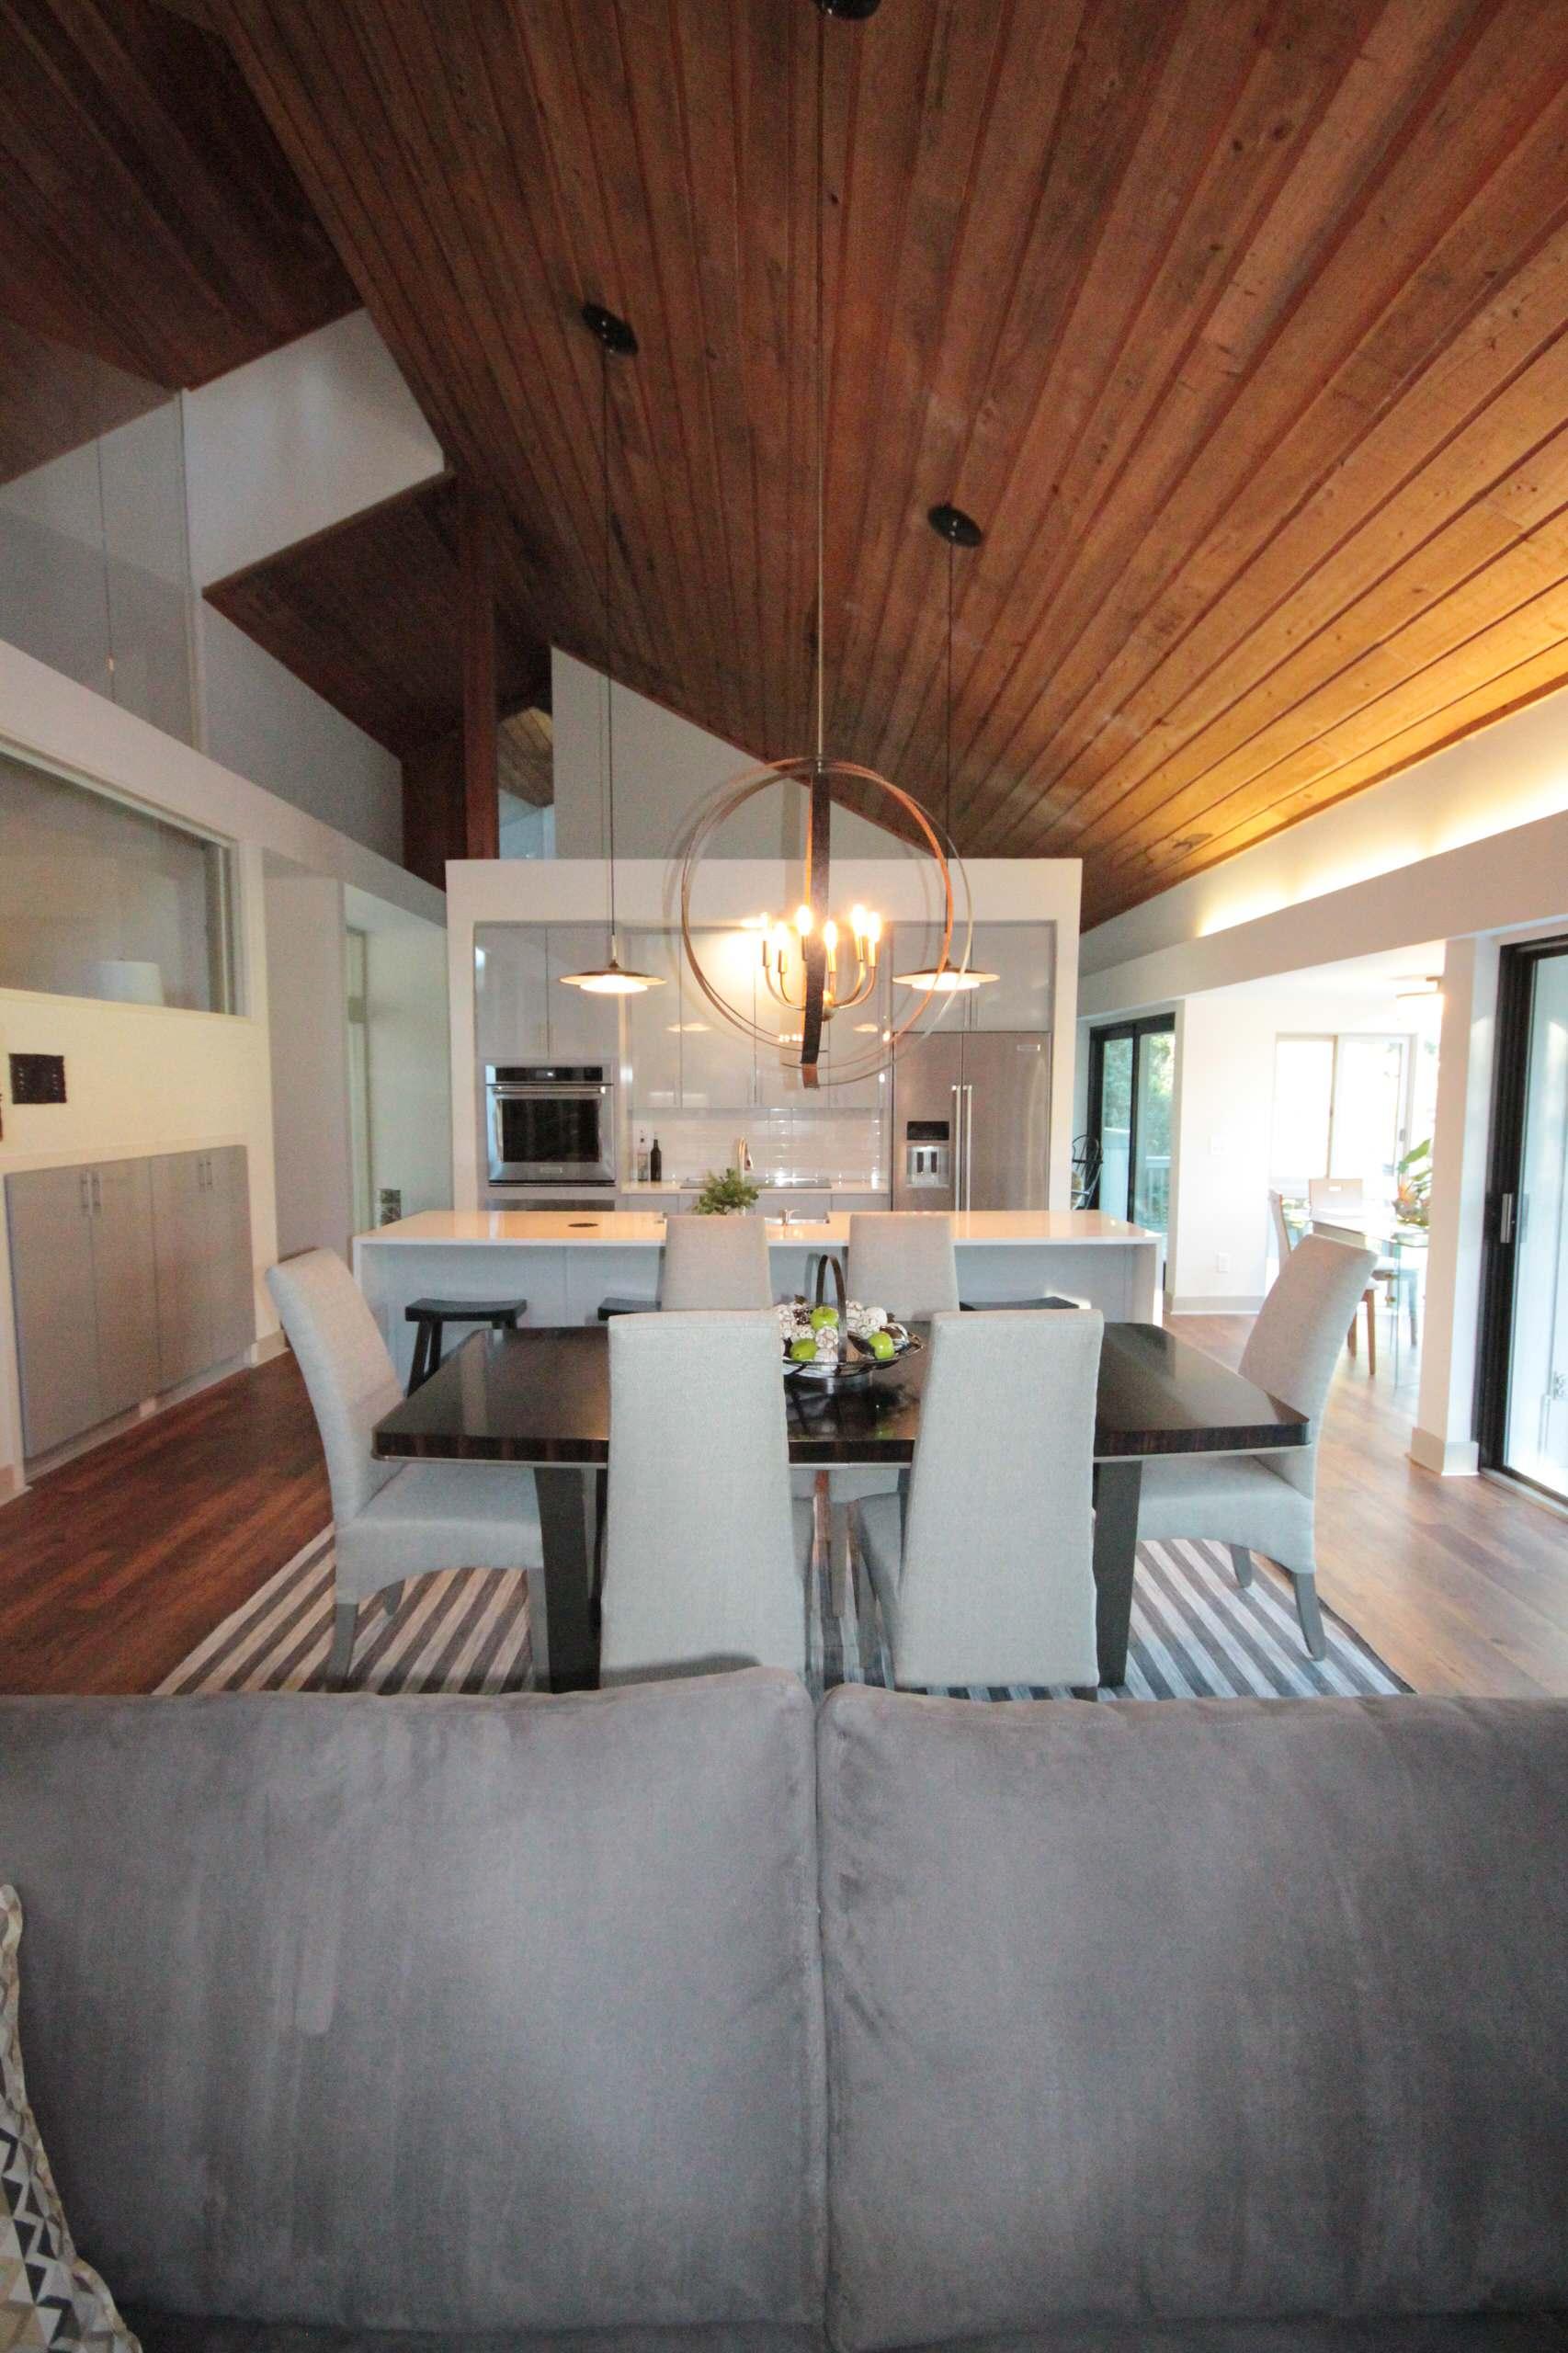 Living Area After Remodel